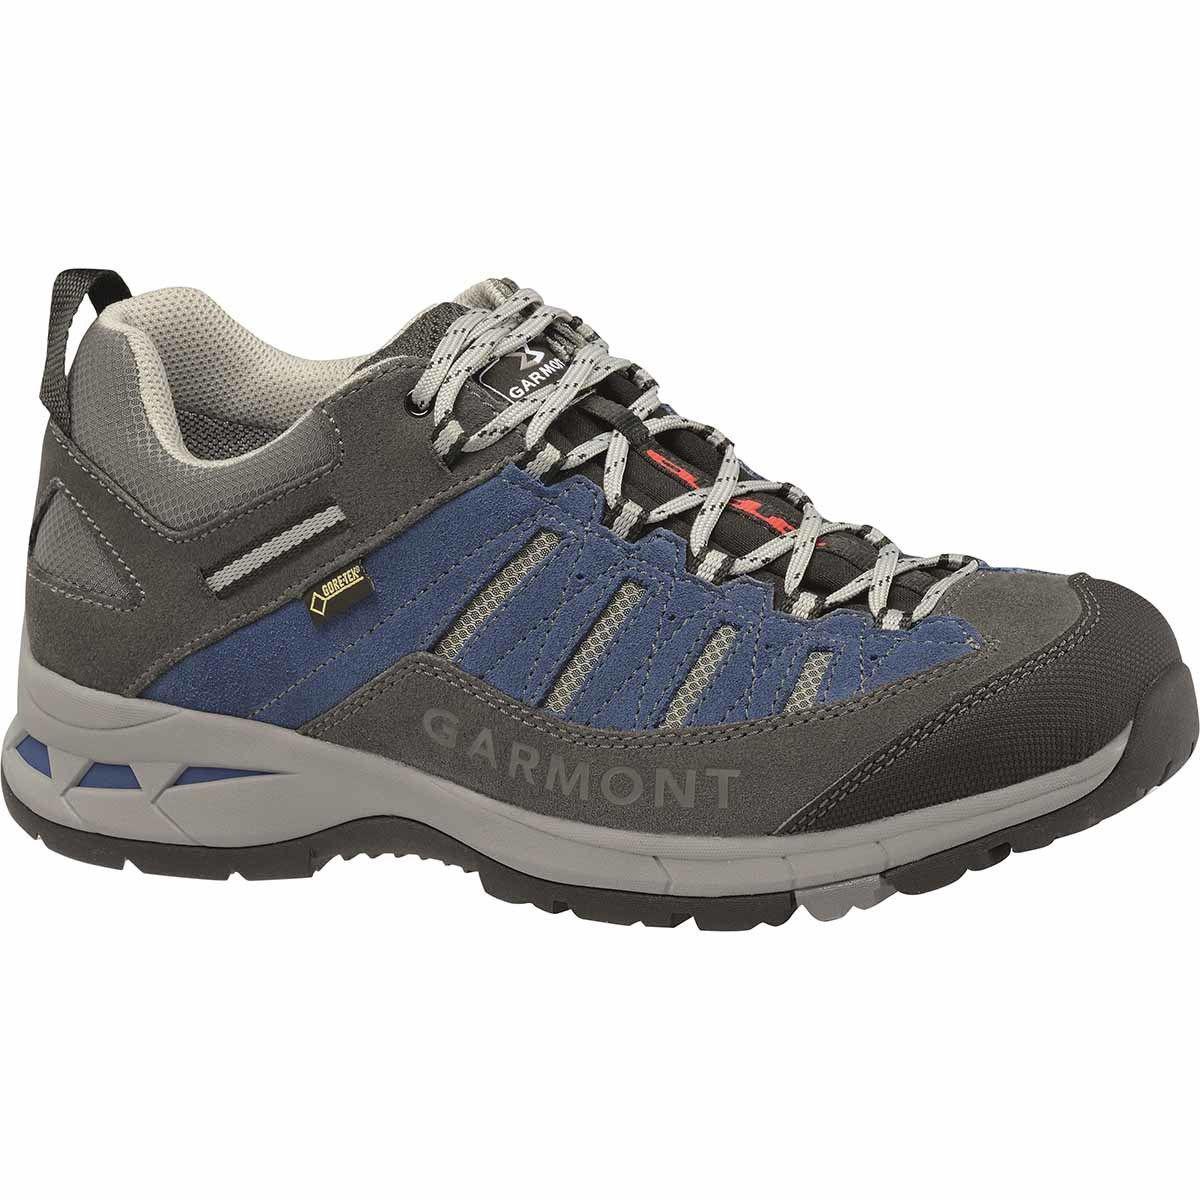 Lyst - Garmont Trail Beast Gtx Hiking Shoe in Blue for Men d726824e9b3